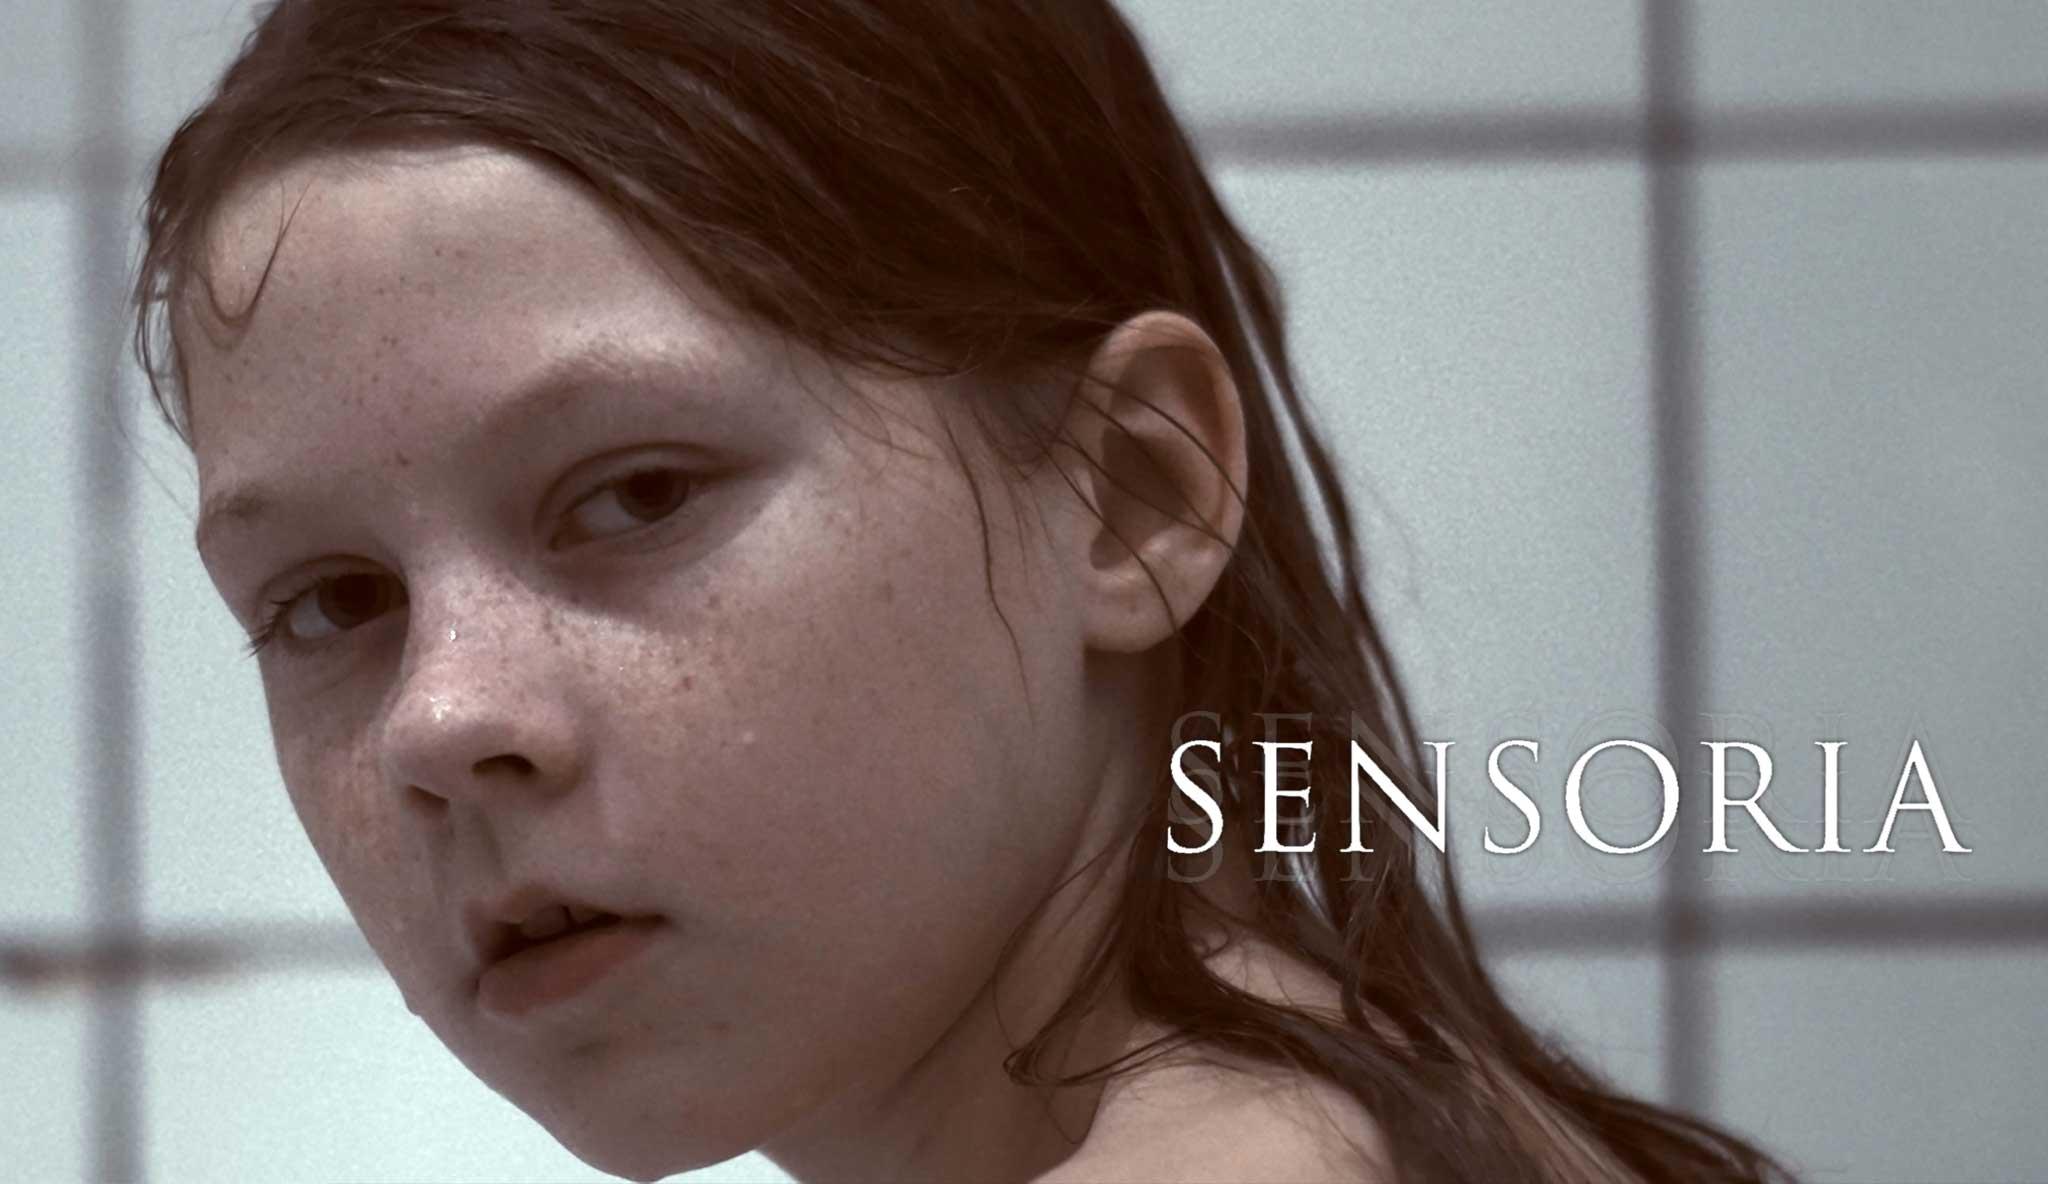 sensoria\header.jpg